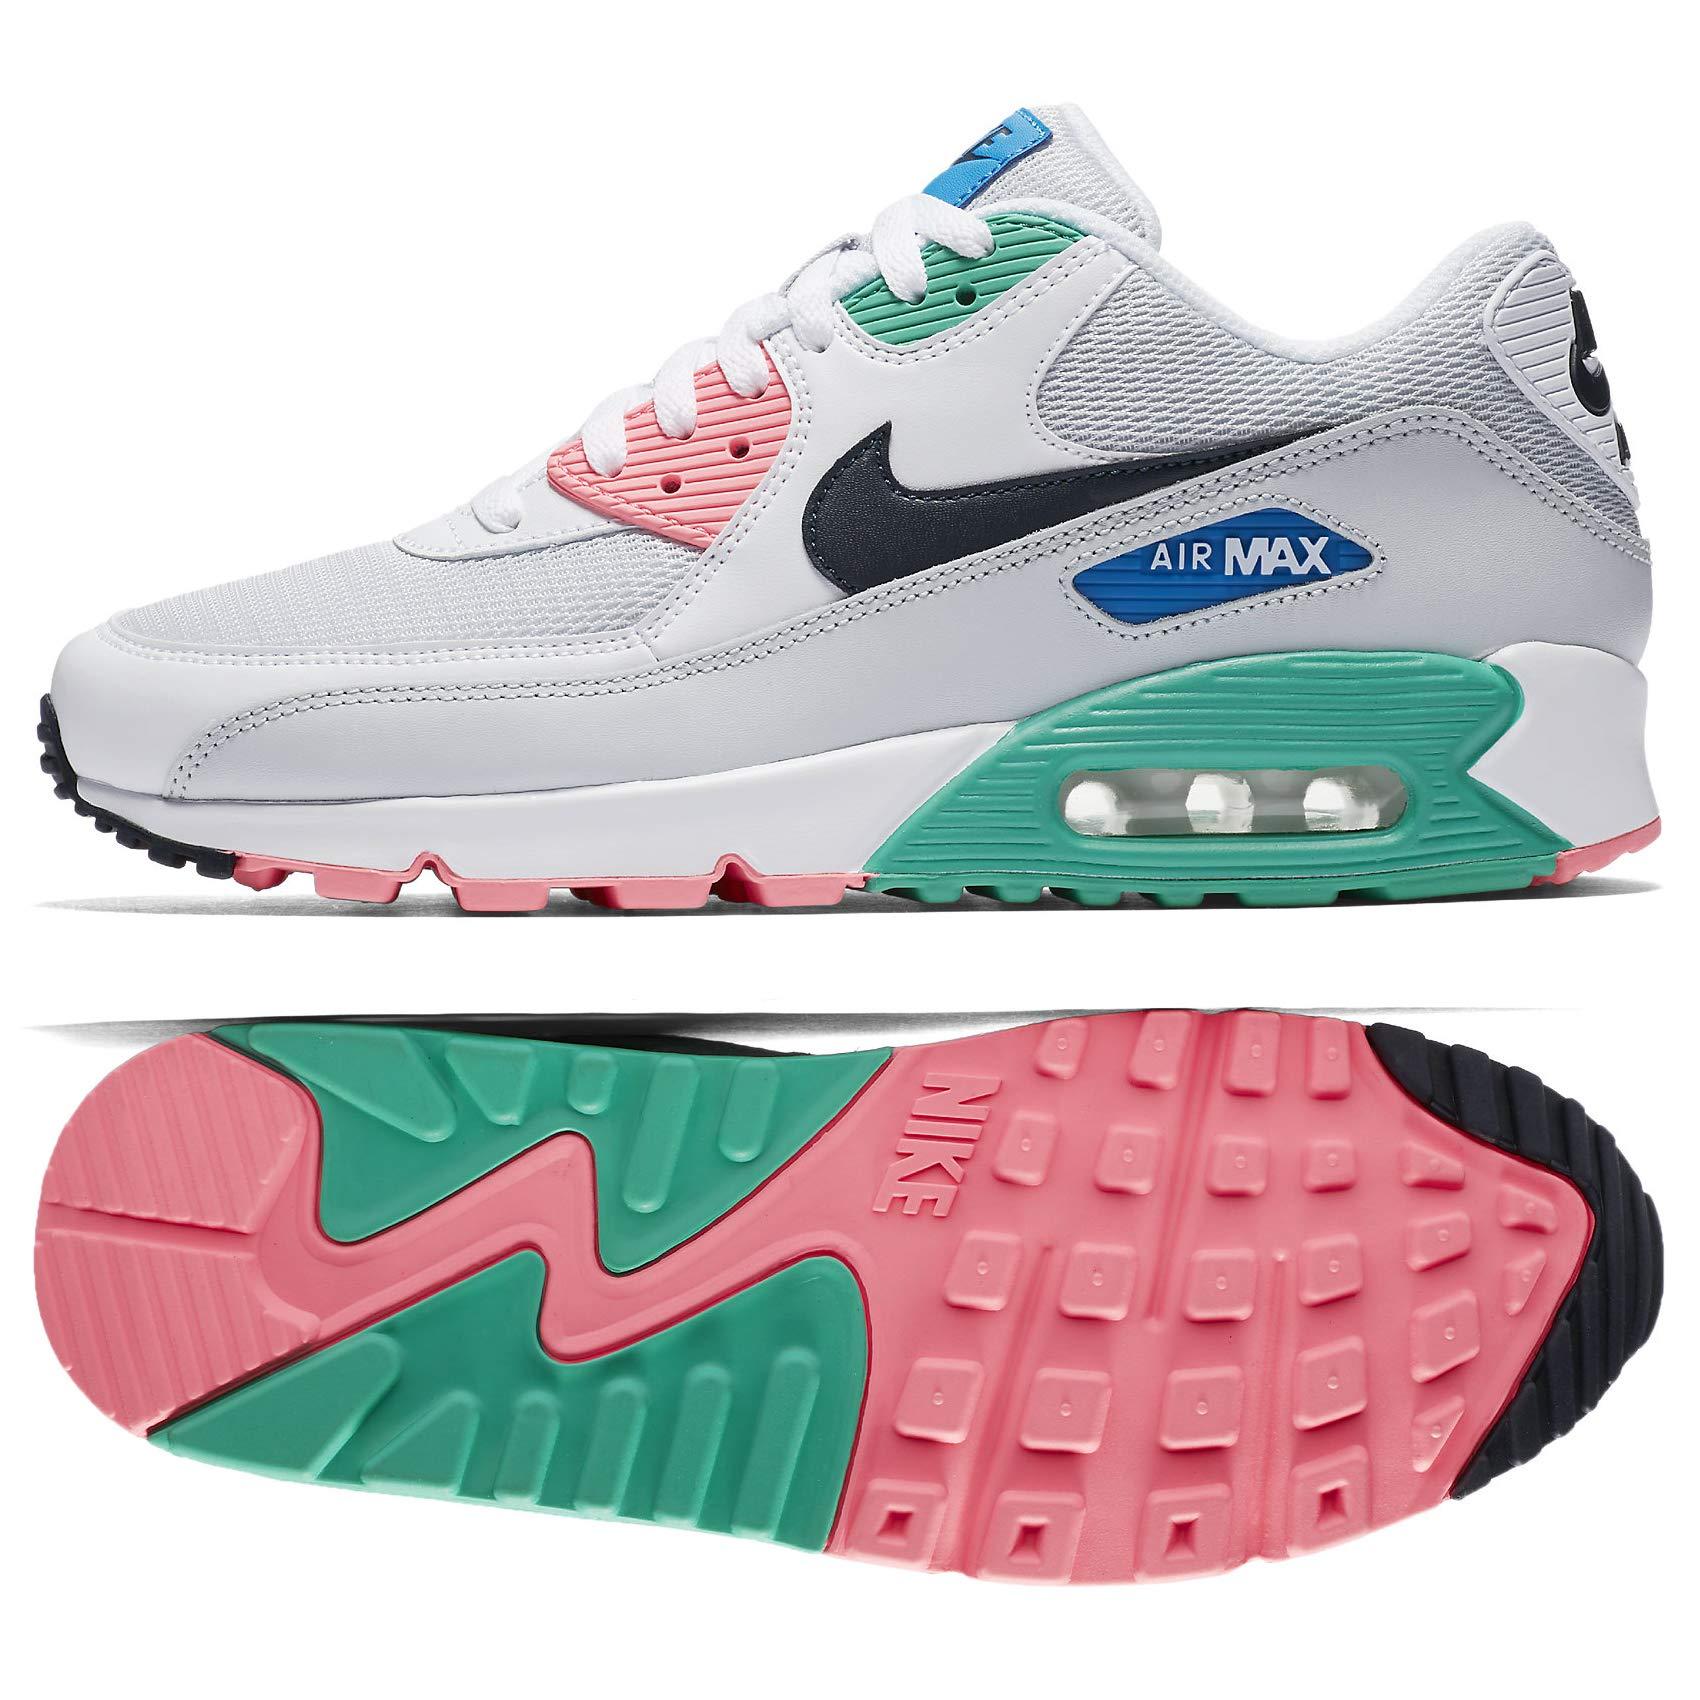 buy online 4c618 e4fa2 Galleon - Nike Mens Air Max 90 Essential Running Shoes White Obsidian Blue  Nebula AJ1285-100 Size 10